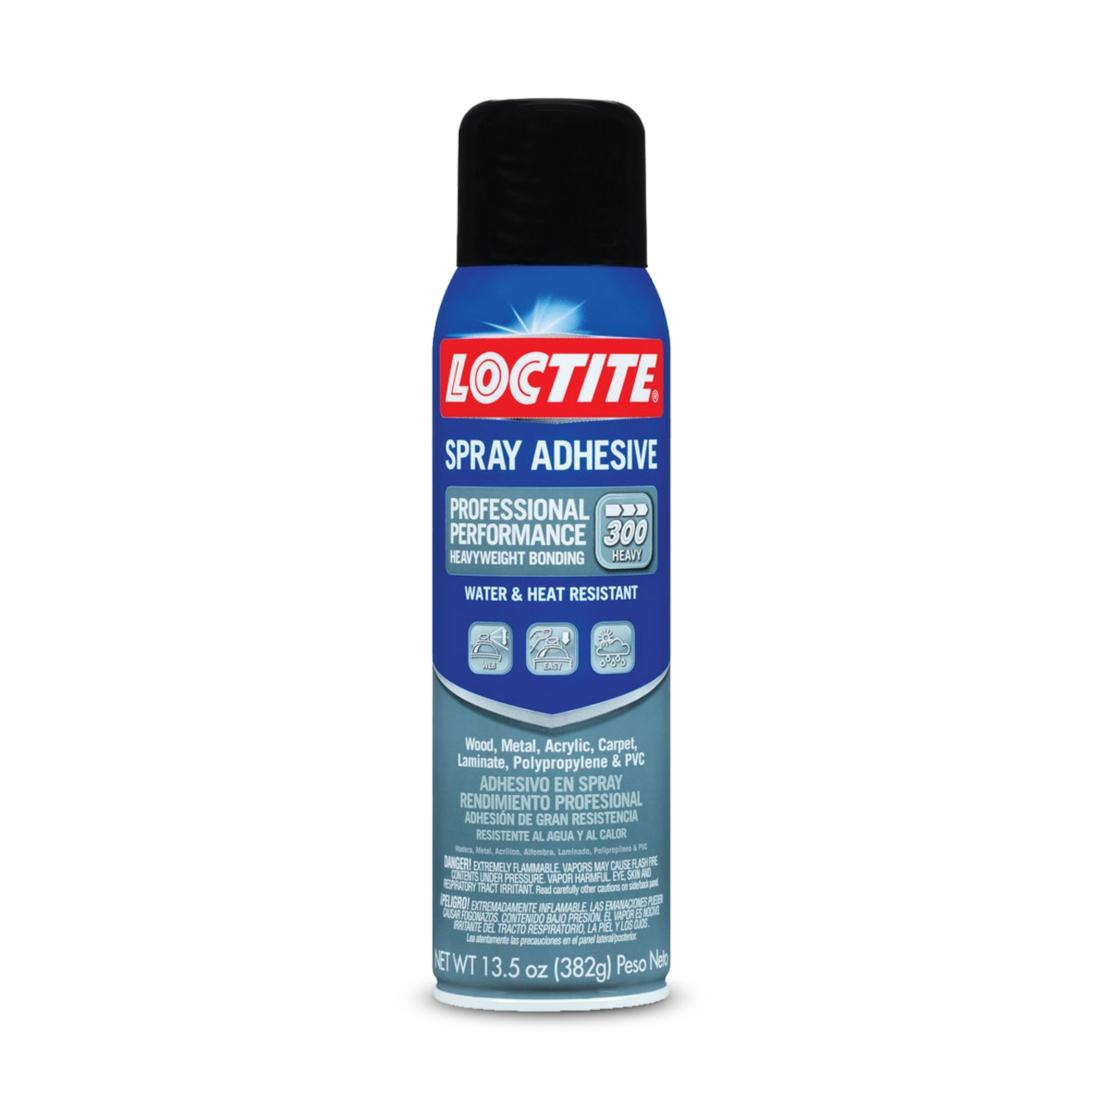 Loctite® Spray Adhesive Professional Performance